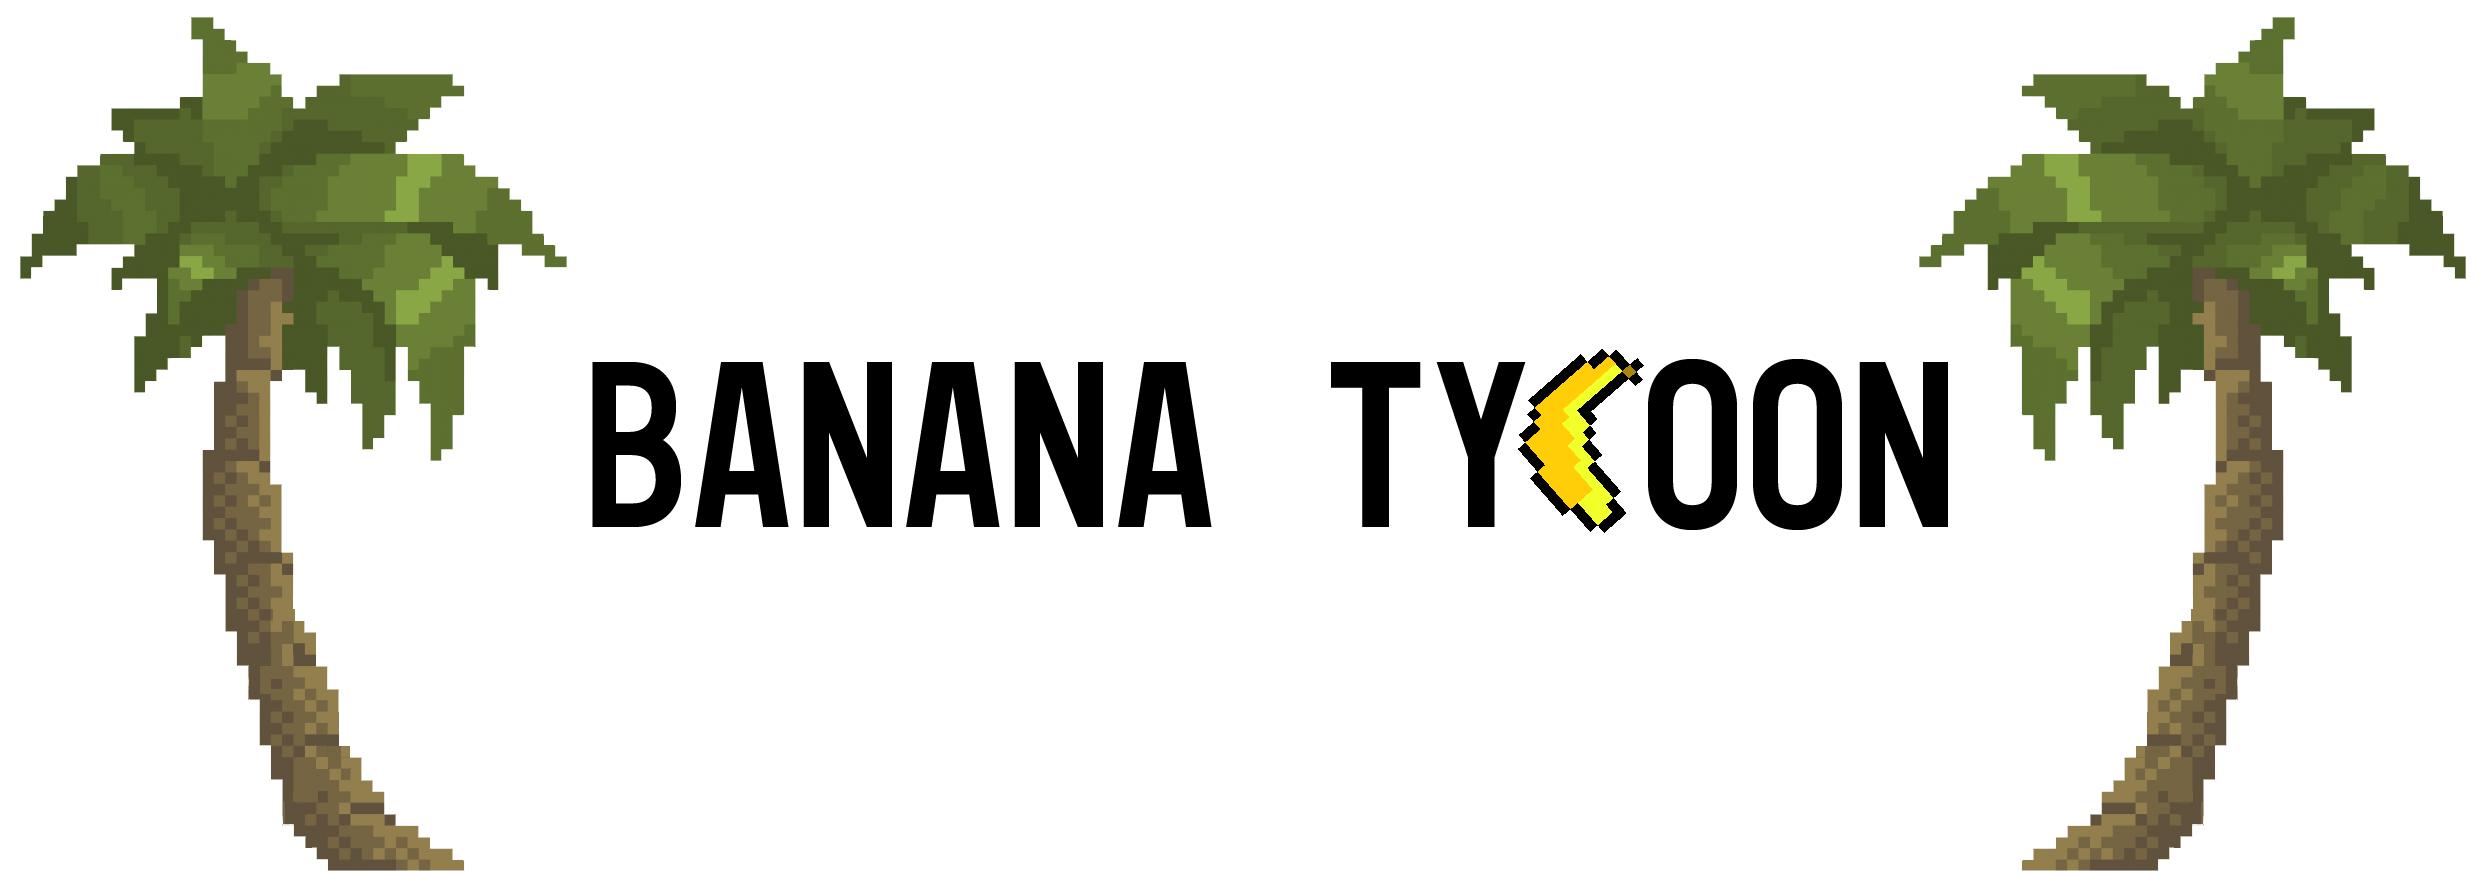 Banana Tycoon